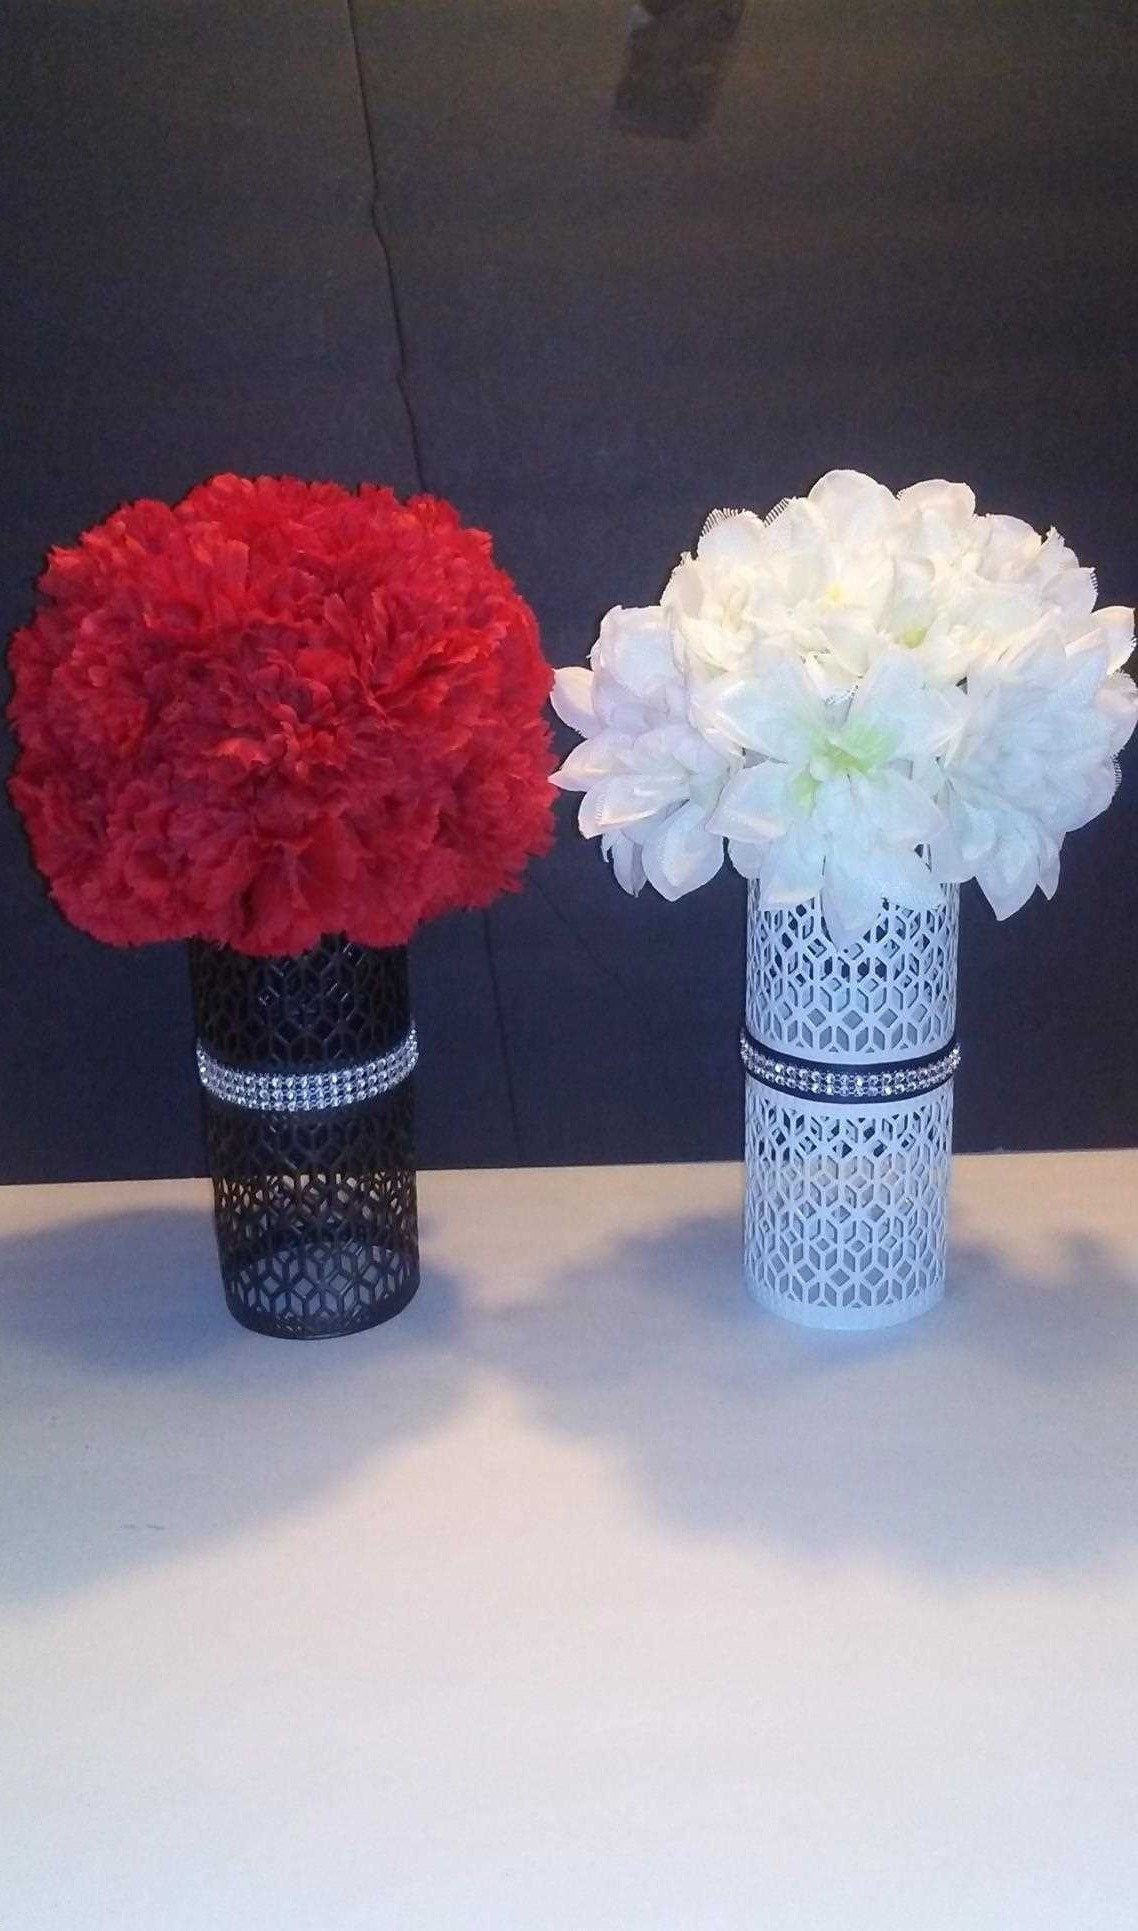 candy vases centerpieces of 10 fresh crystal vase bogekompresorturkiye com in wedding floral centerpieces awesome dollar tree wedding decorations awesome h vases dollar vase i 0d